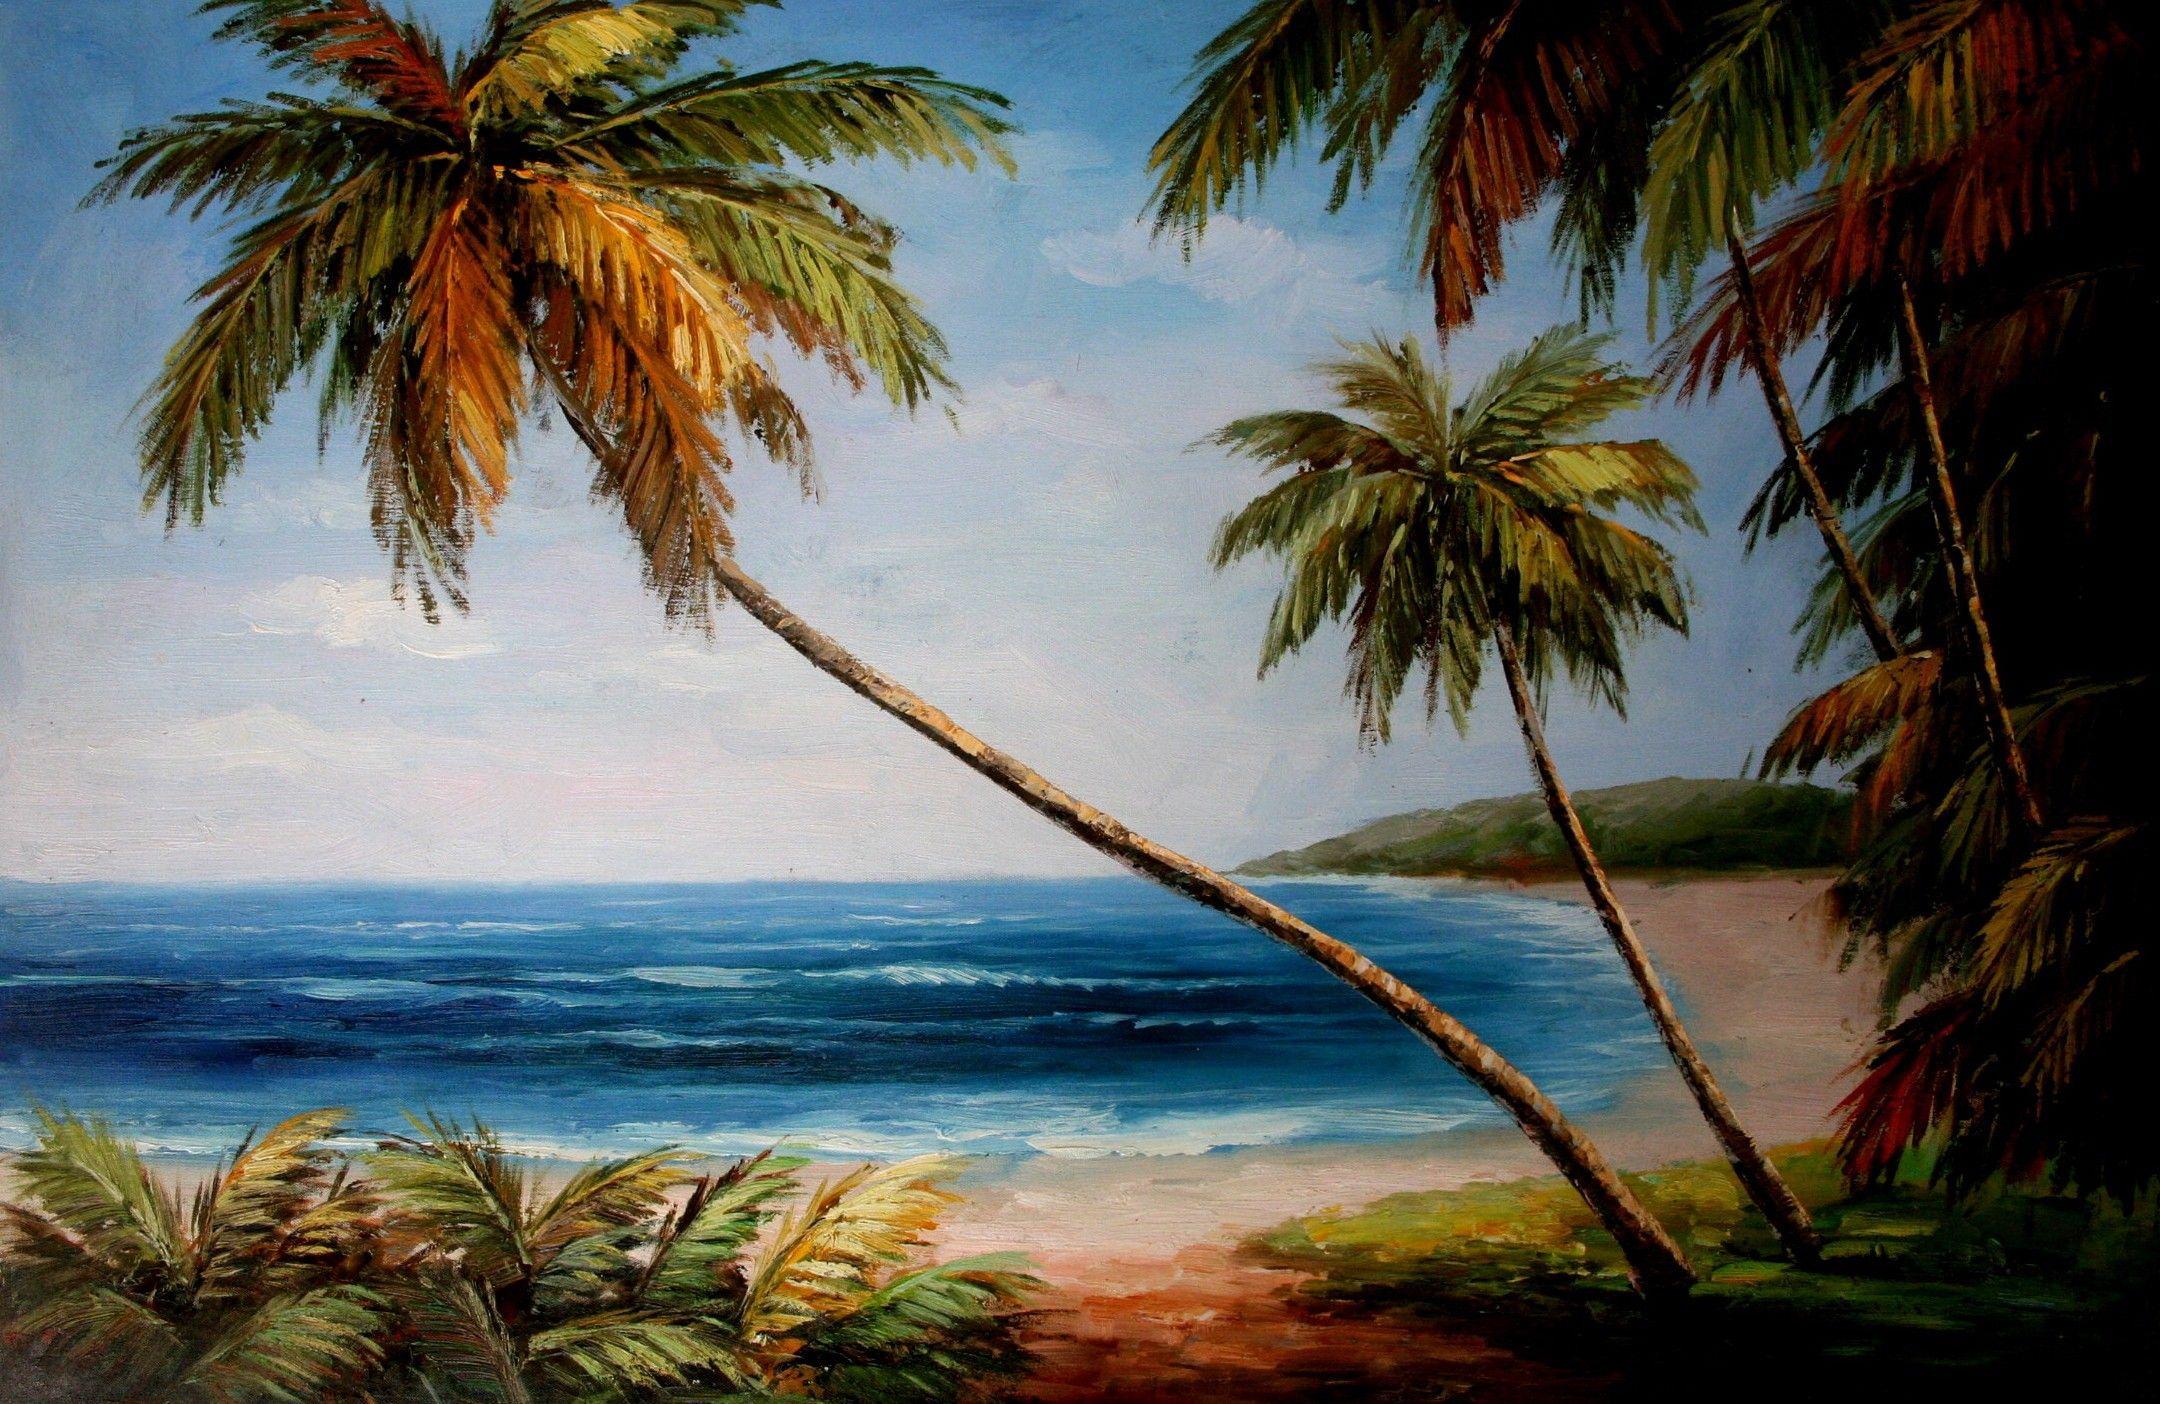 Hand Painted Landscape Oil Paintings La 0064 Resim Resimler Gorsel Sanatlar